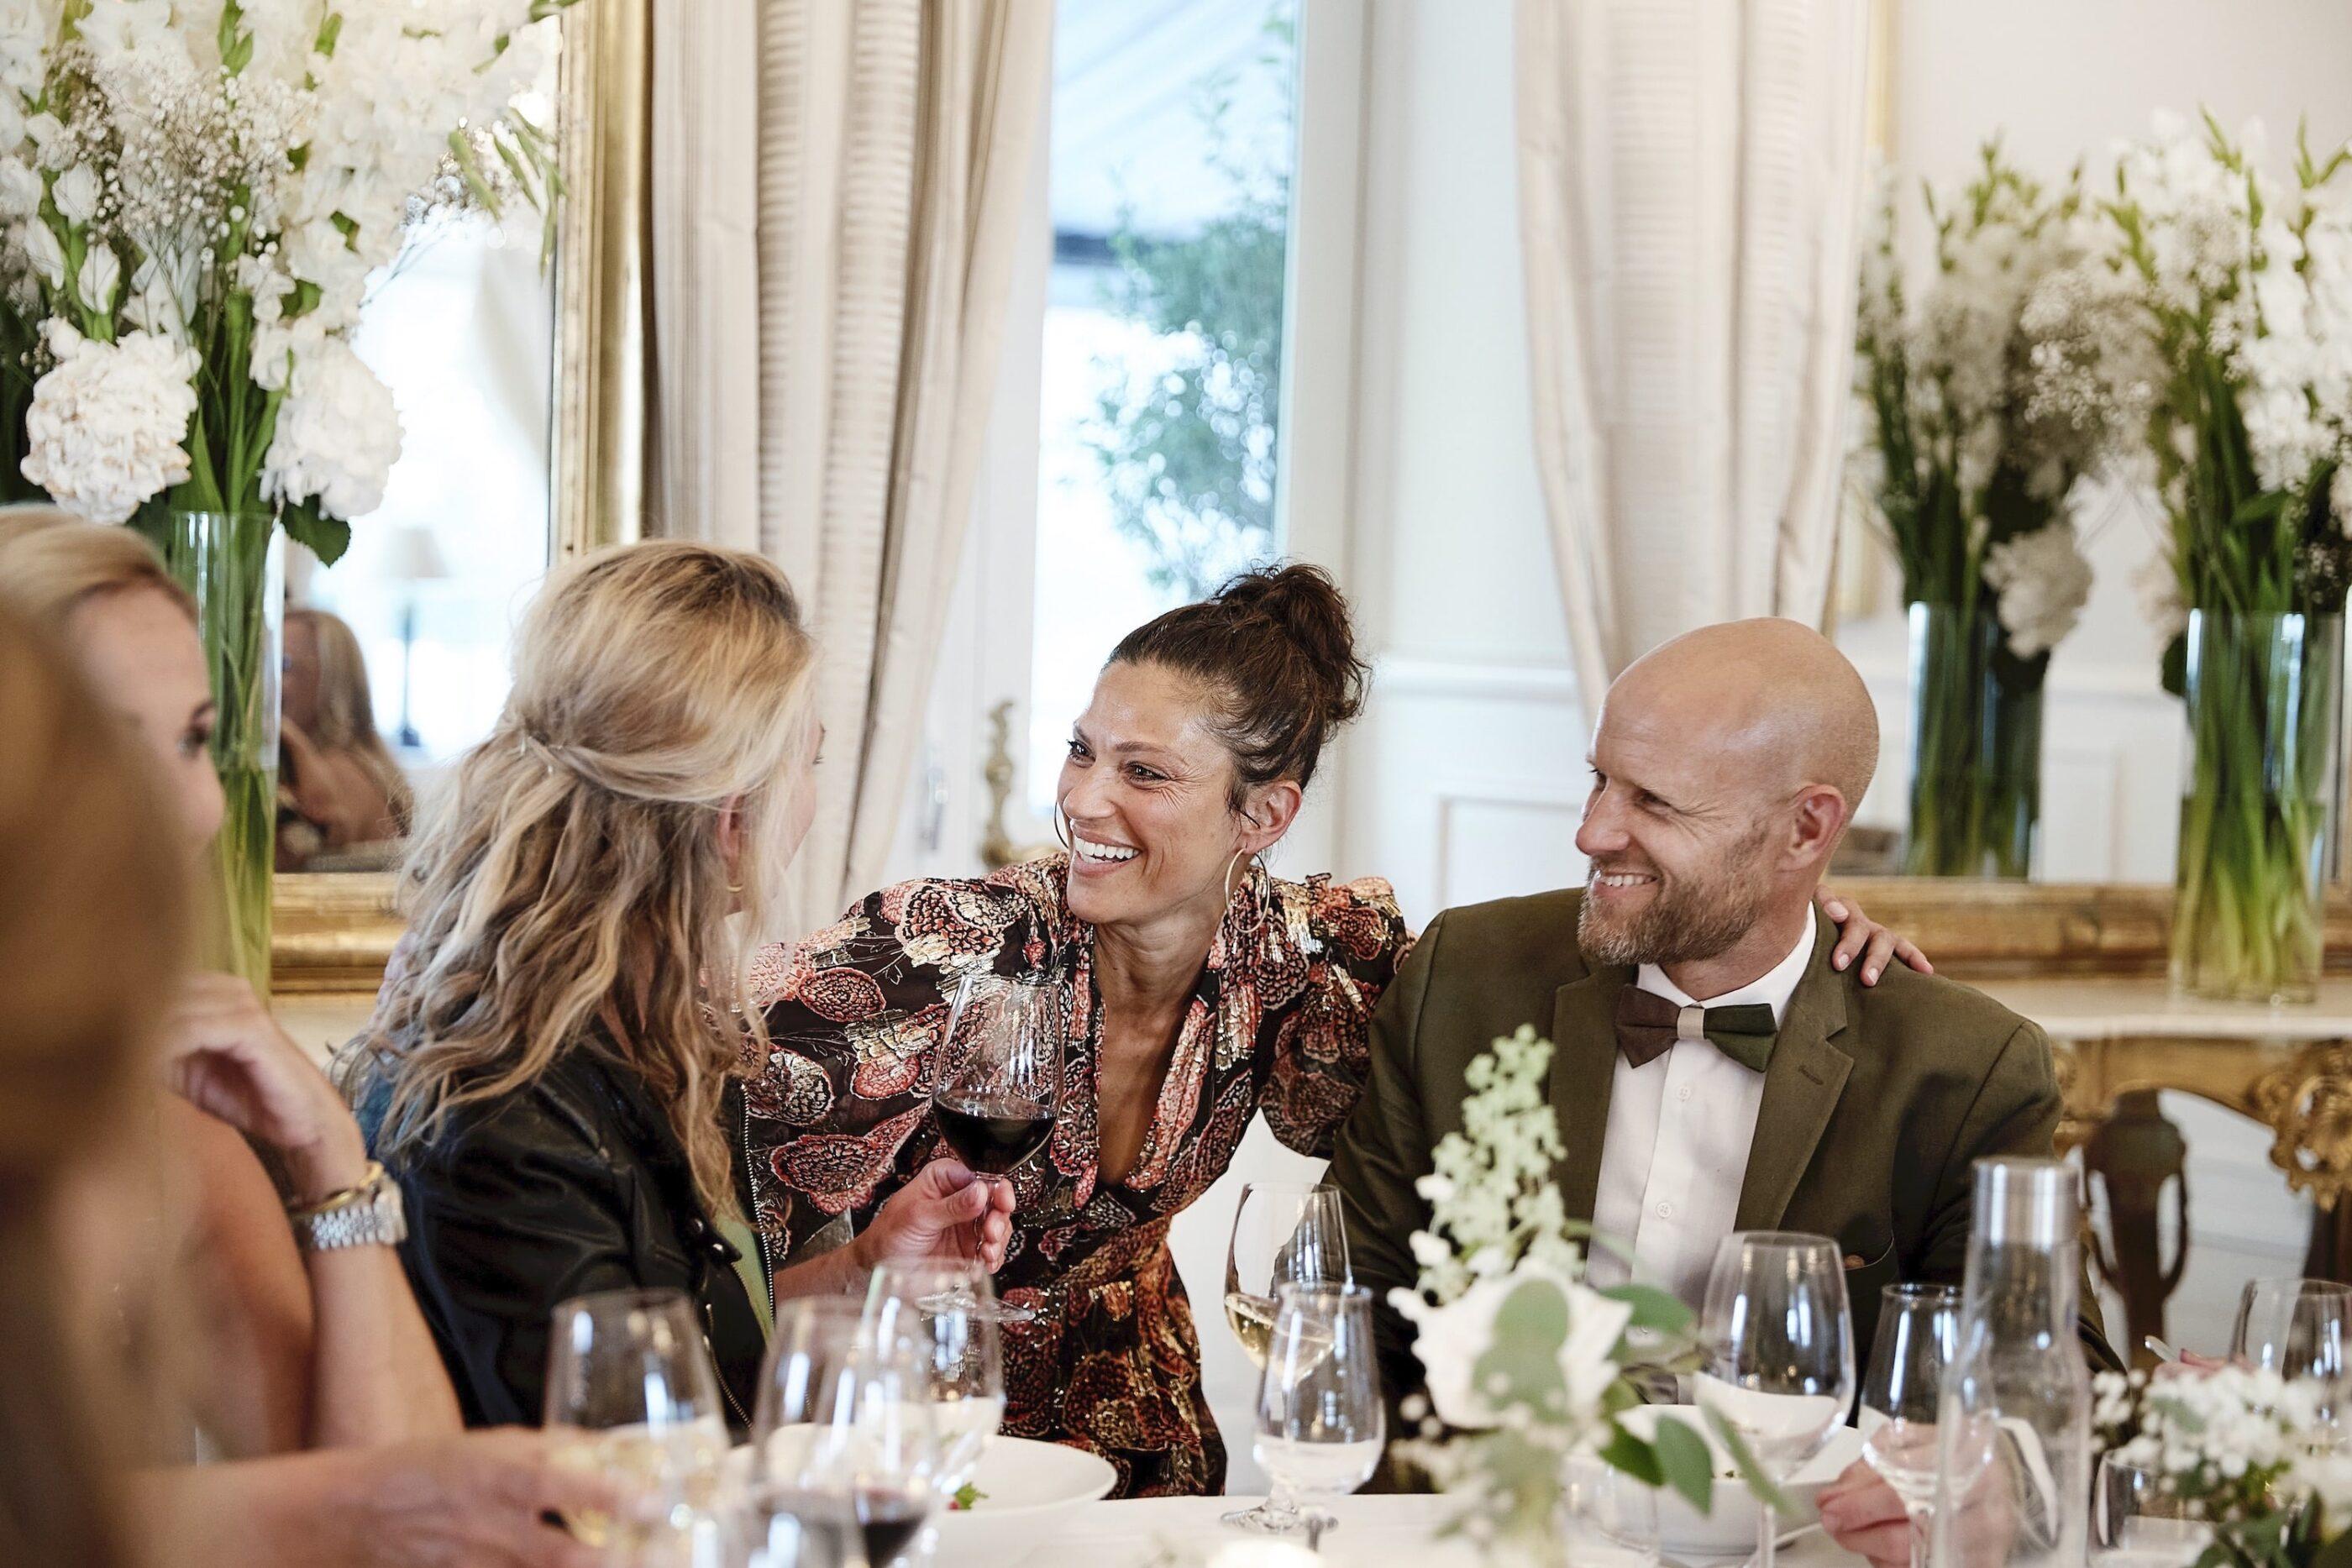 3 mennesker snakker og drikker rødvin ved middagsbordet